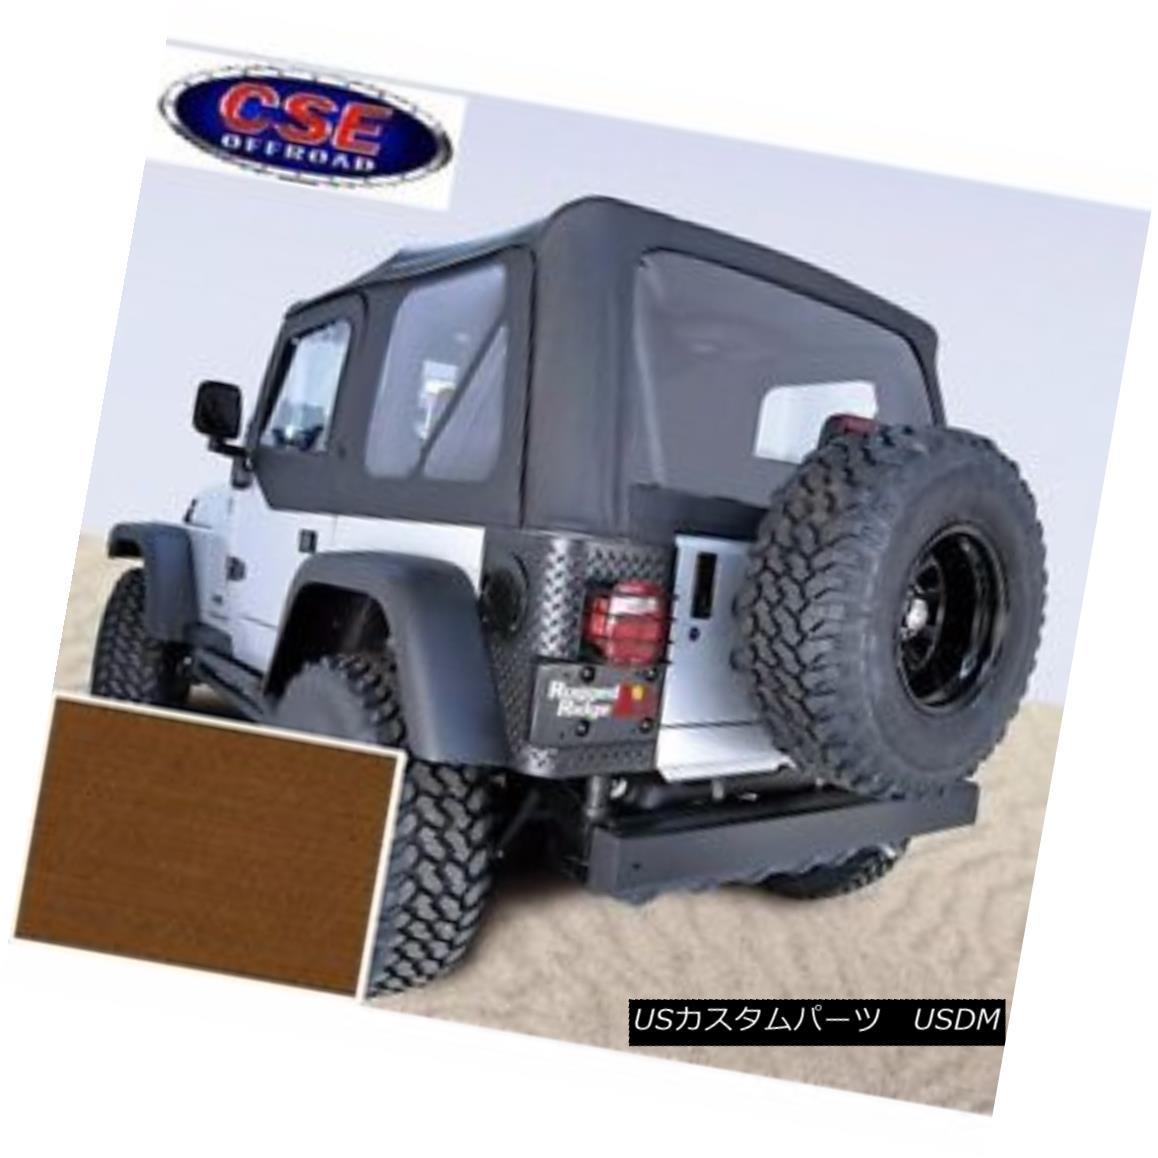 Tan Windows ダークタンソフトトップドアスキンクリアウィンドウジープラングラーTJ Skins Dark Jeep TJ 13703.33 97-02 Door Clear 13703.33 Wrangler Soft 幌・ソフトトップ Top with 97-02